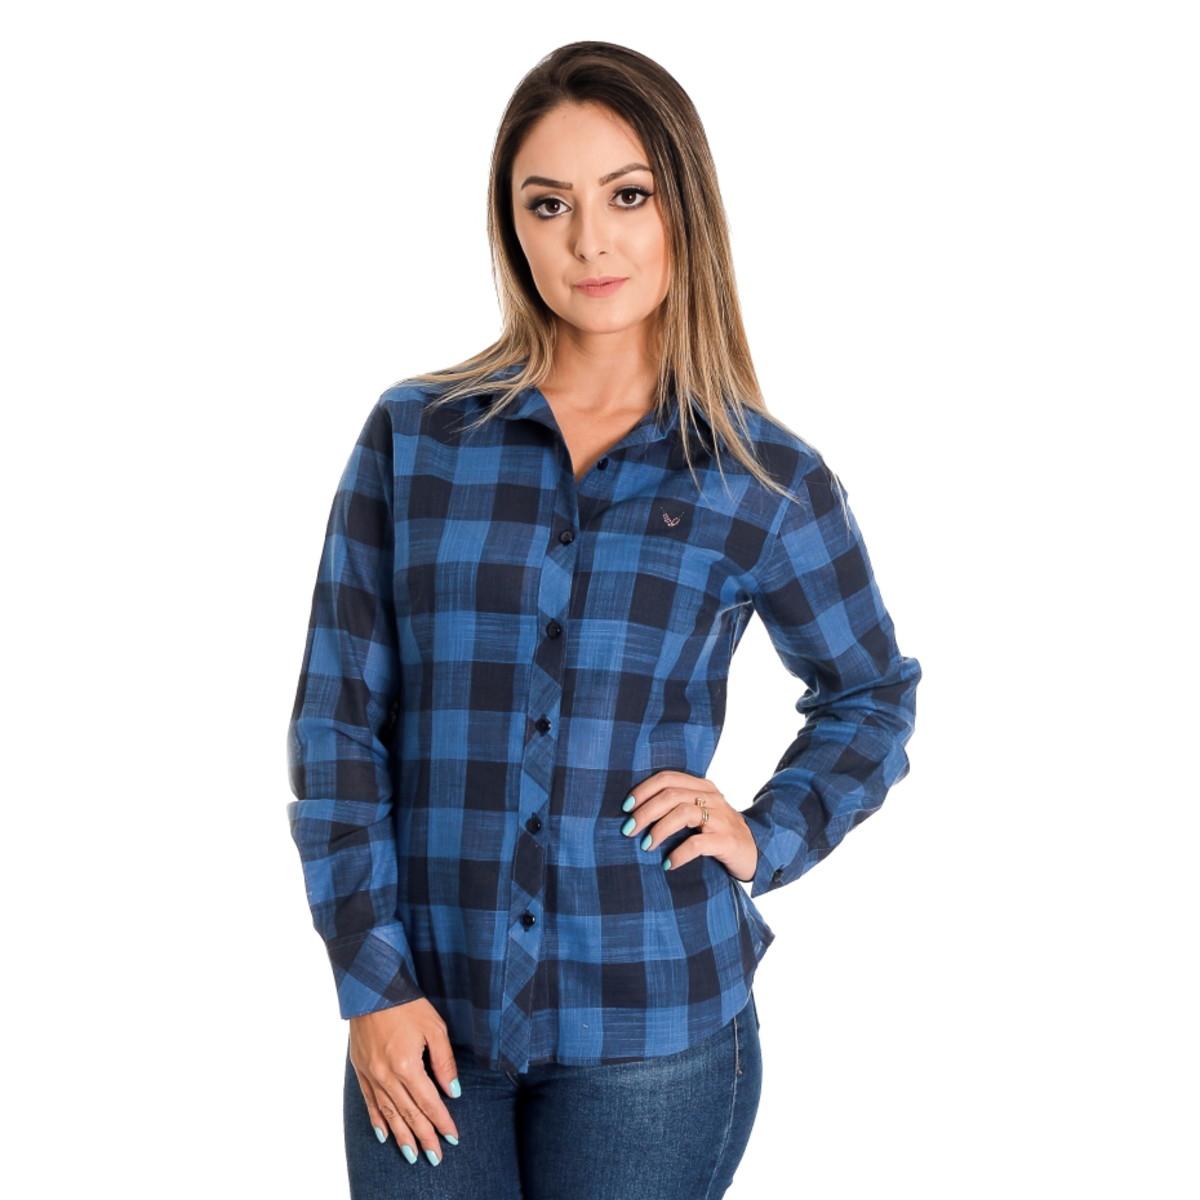 cc8932d30 Camisa Feminina Xadrez Kyara - Pimenta Rosada no Elo7 | Pimenta ...